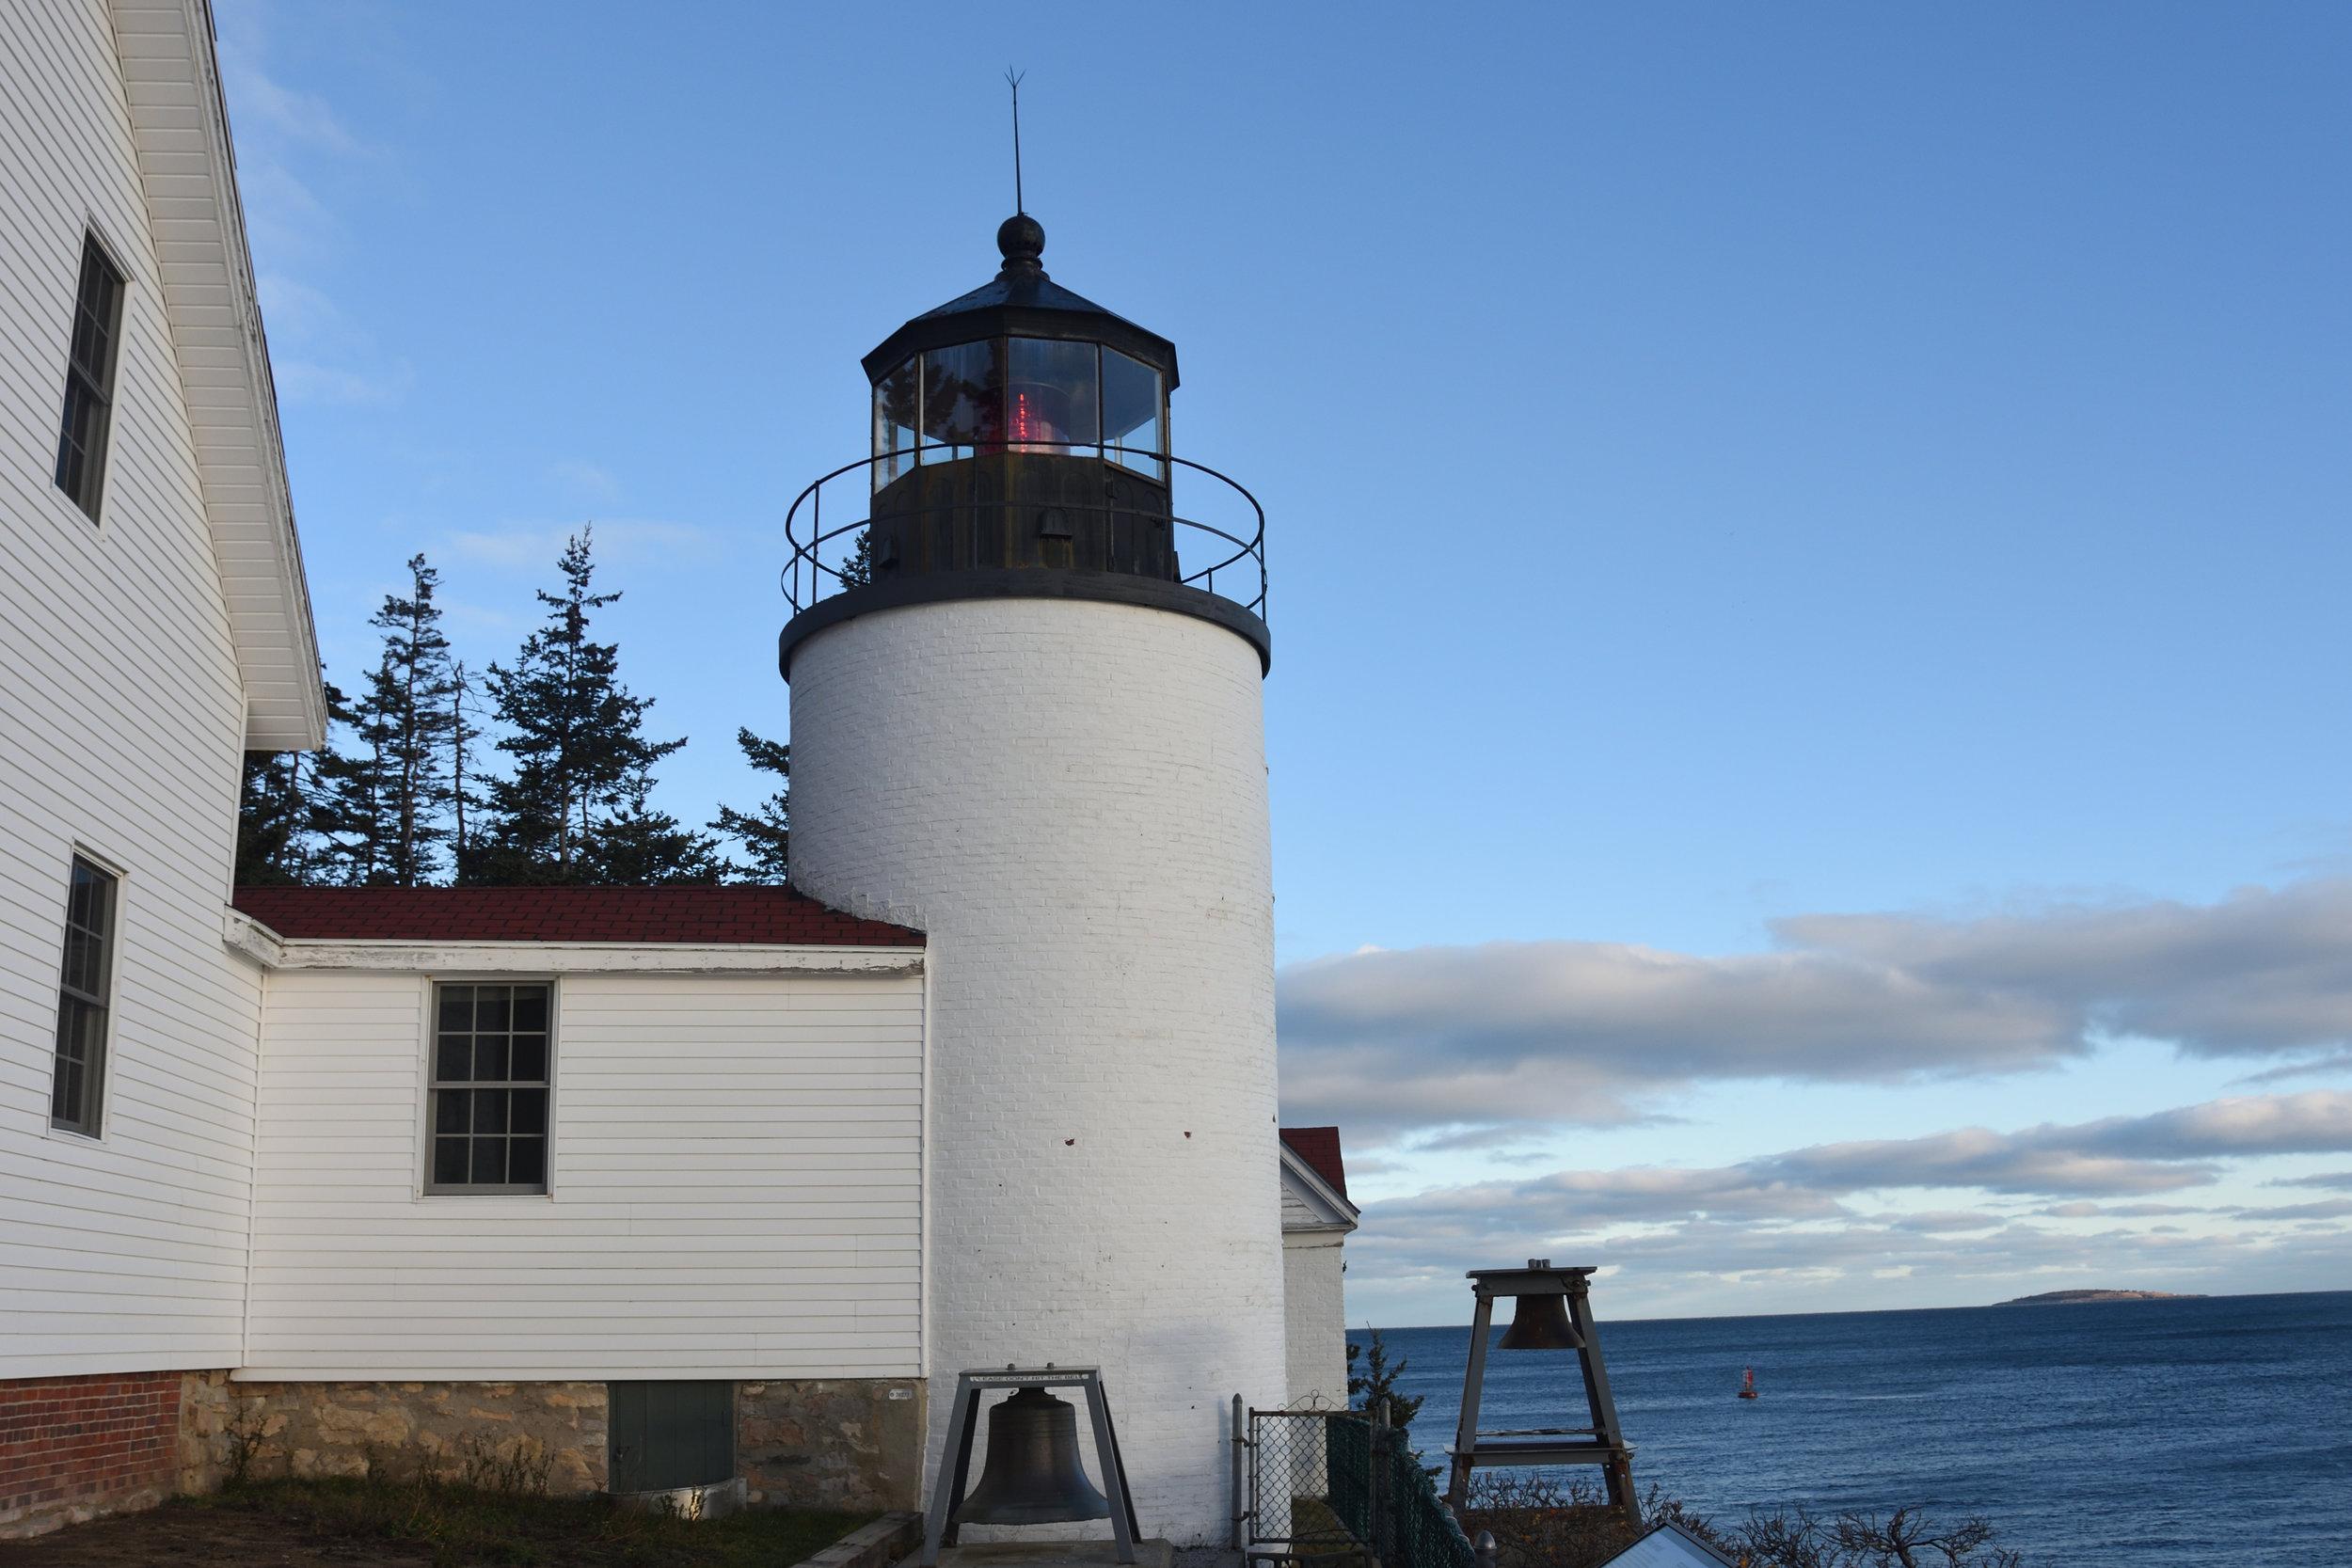 Bass Harbor Lighthouse, ME 2016